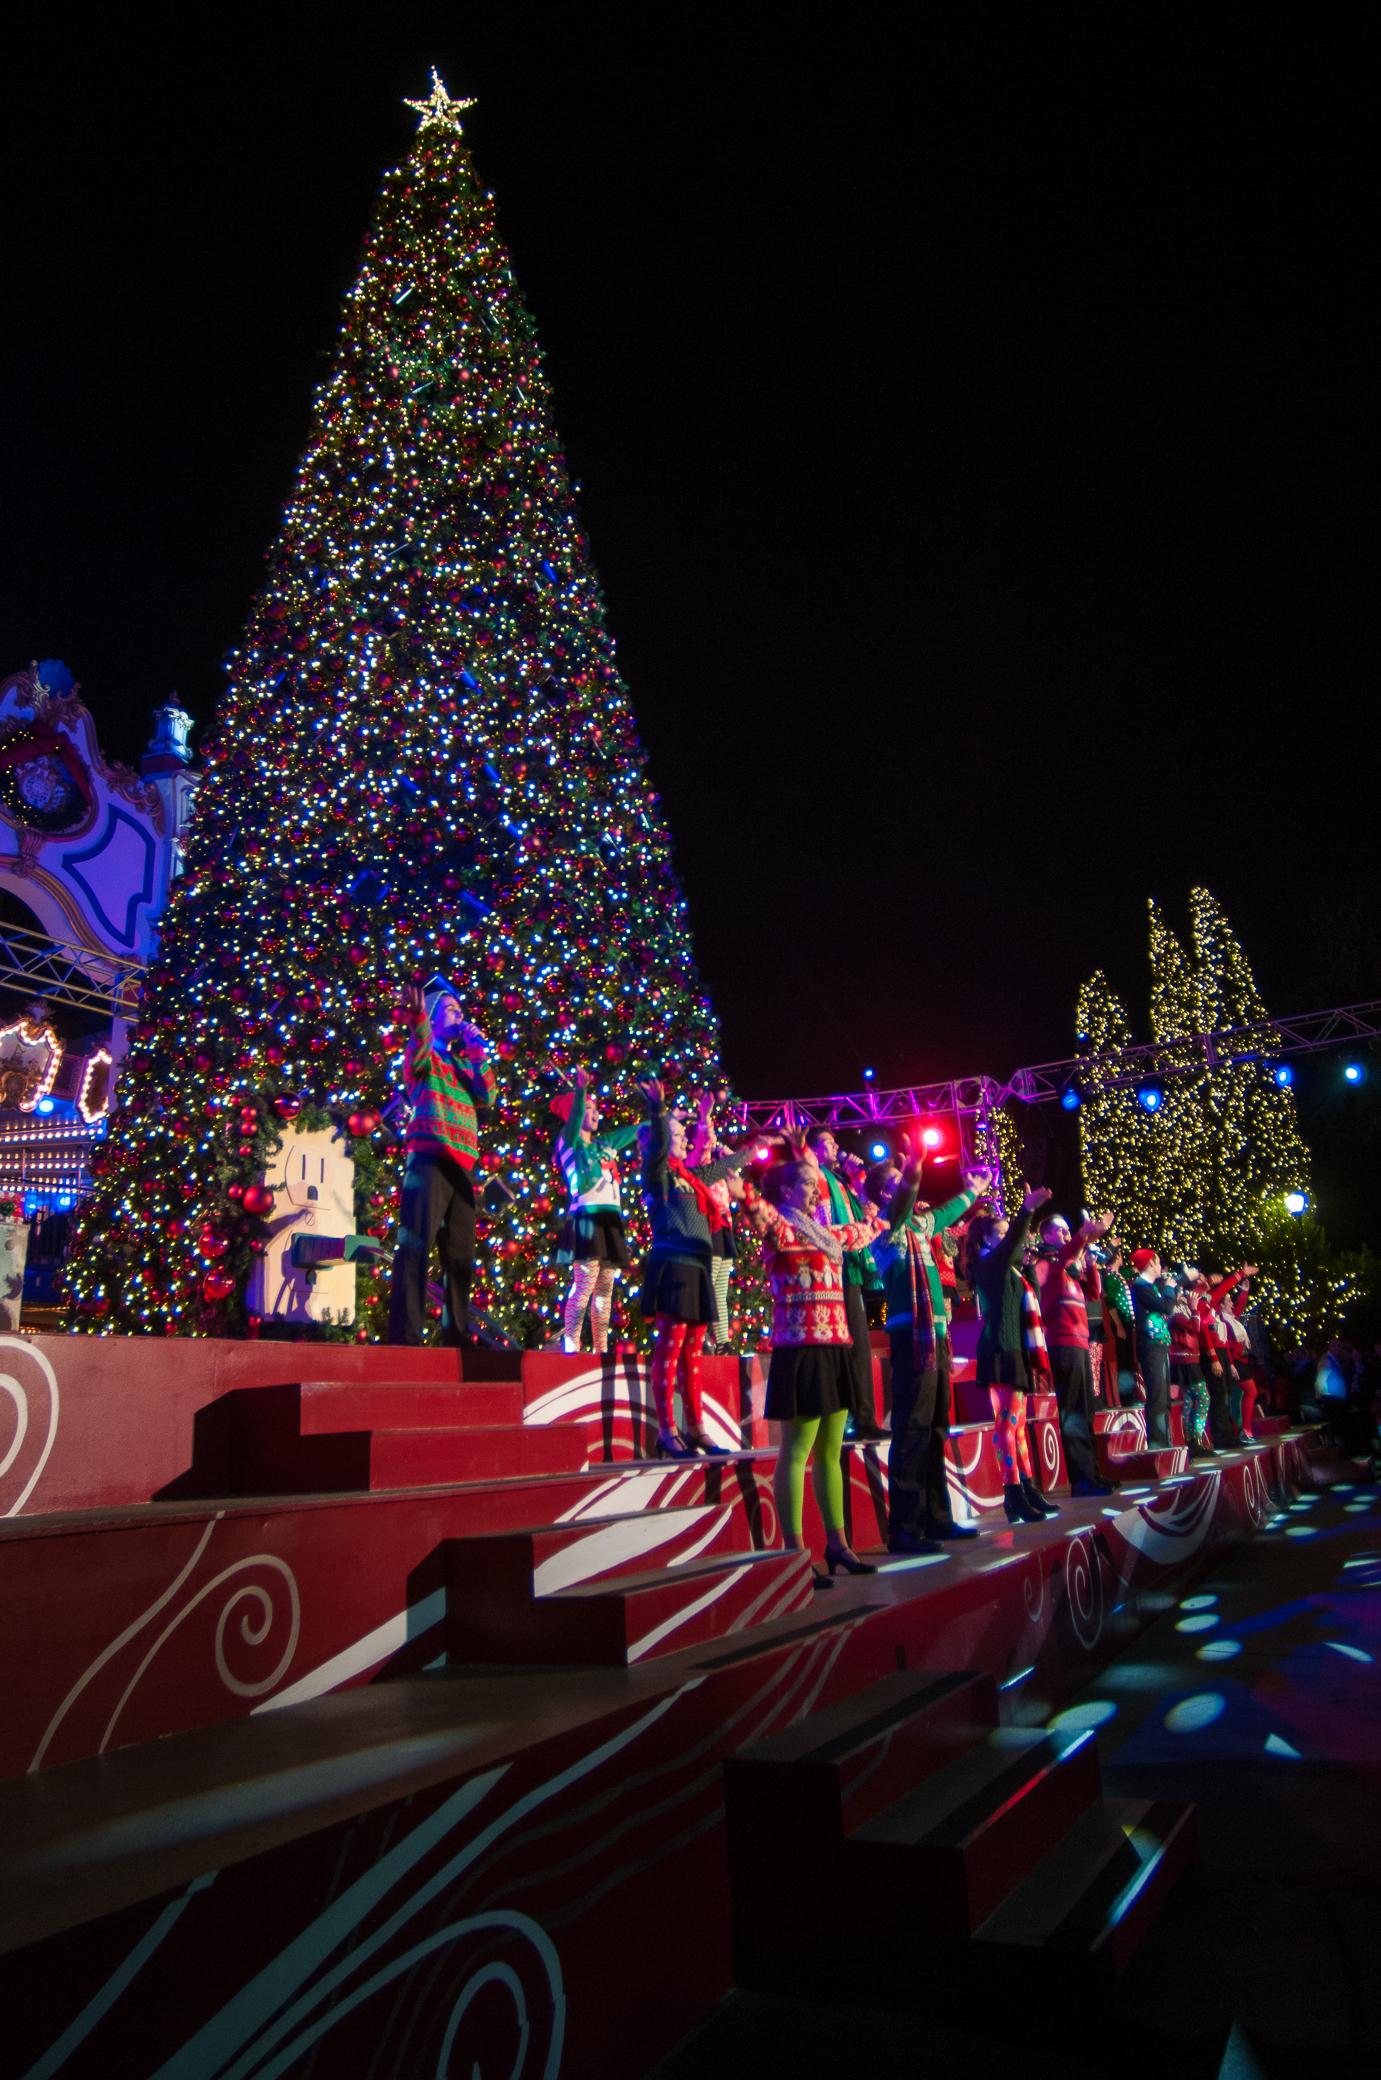 tree lighting ceremony celebration plaza californias great america santa clara 12